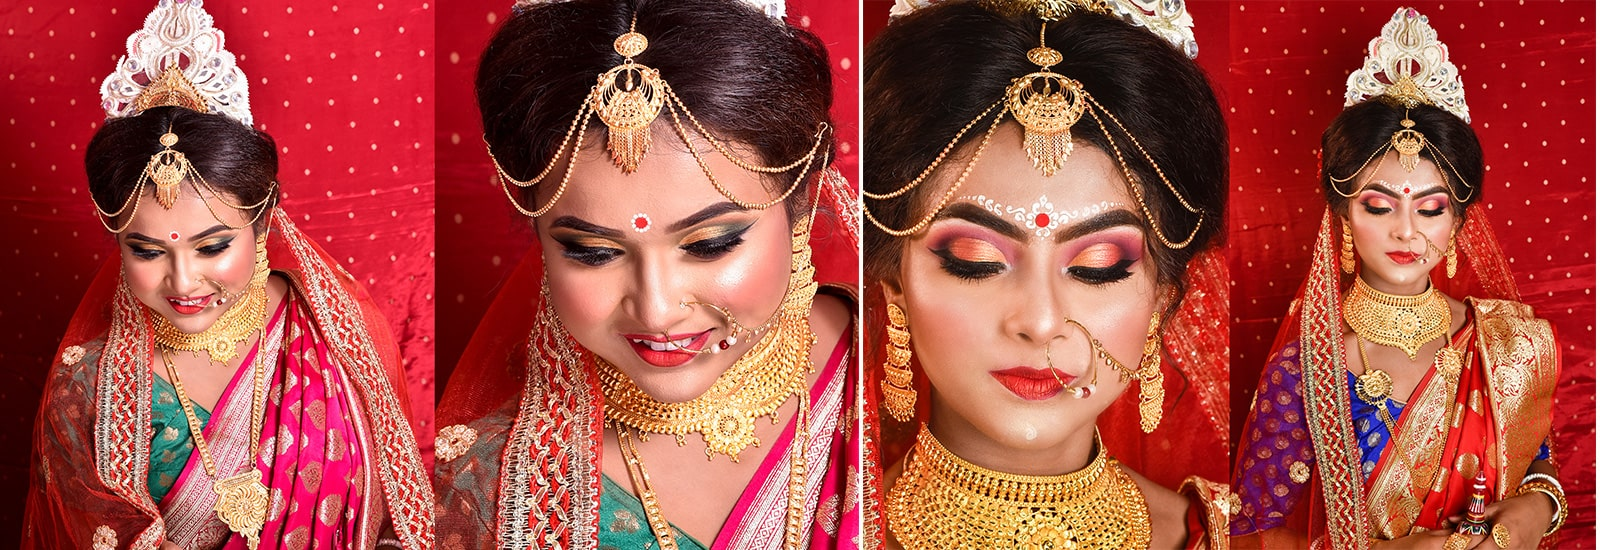 best-wedding-makeup-artist-in-kolkata-glisten-makeover-by-nikita